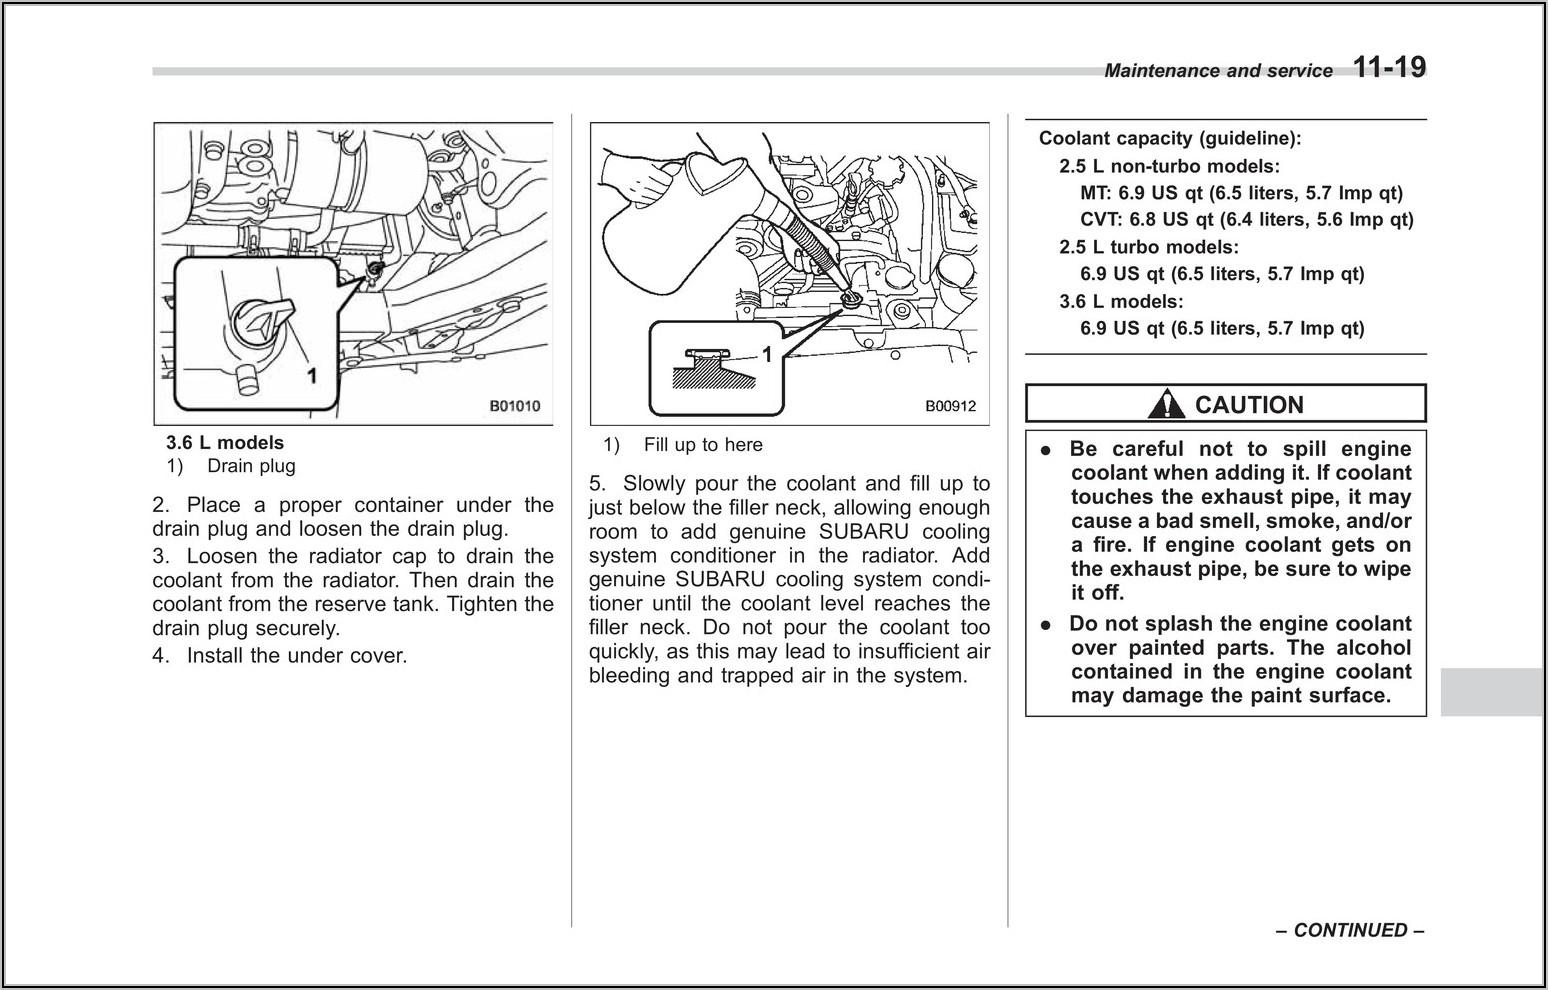 2012 Vw Jetta Engine Fuse Box Diagram